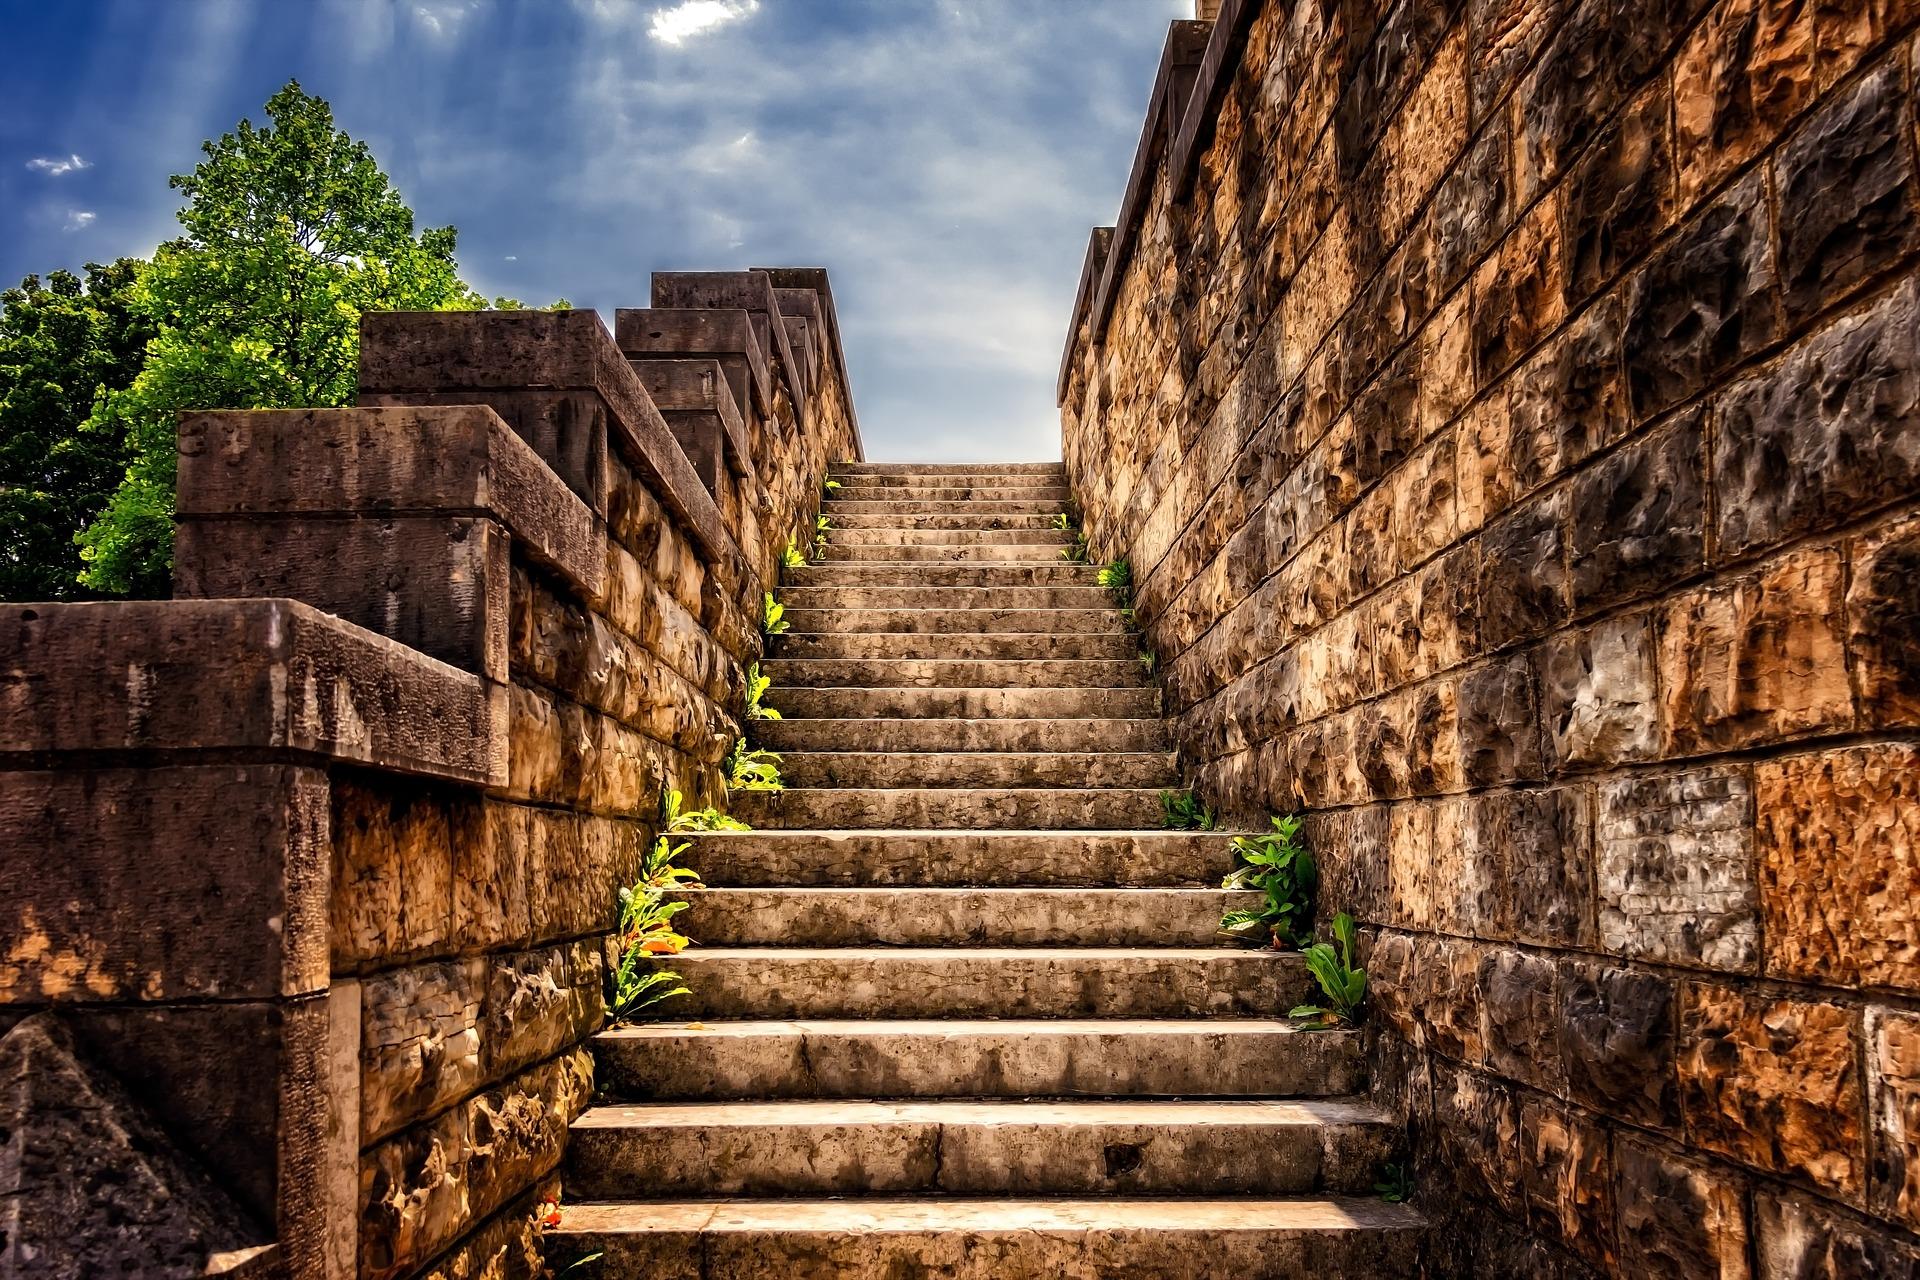 Brick steps heading up